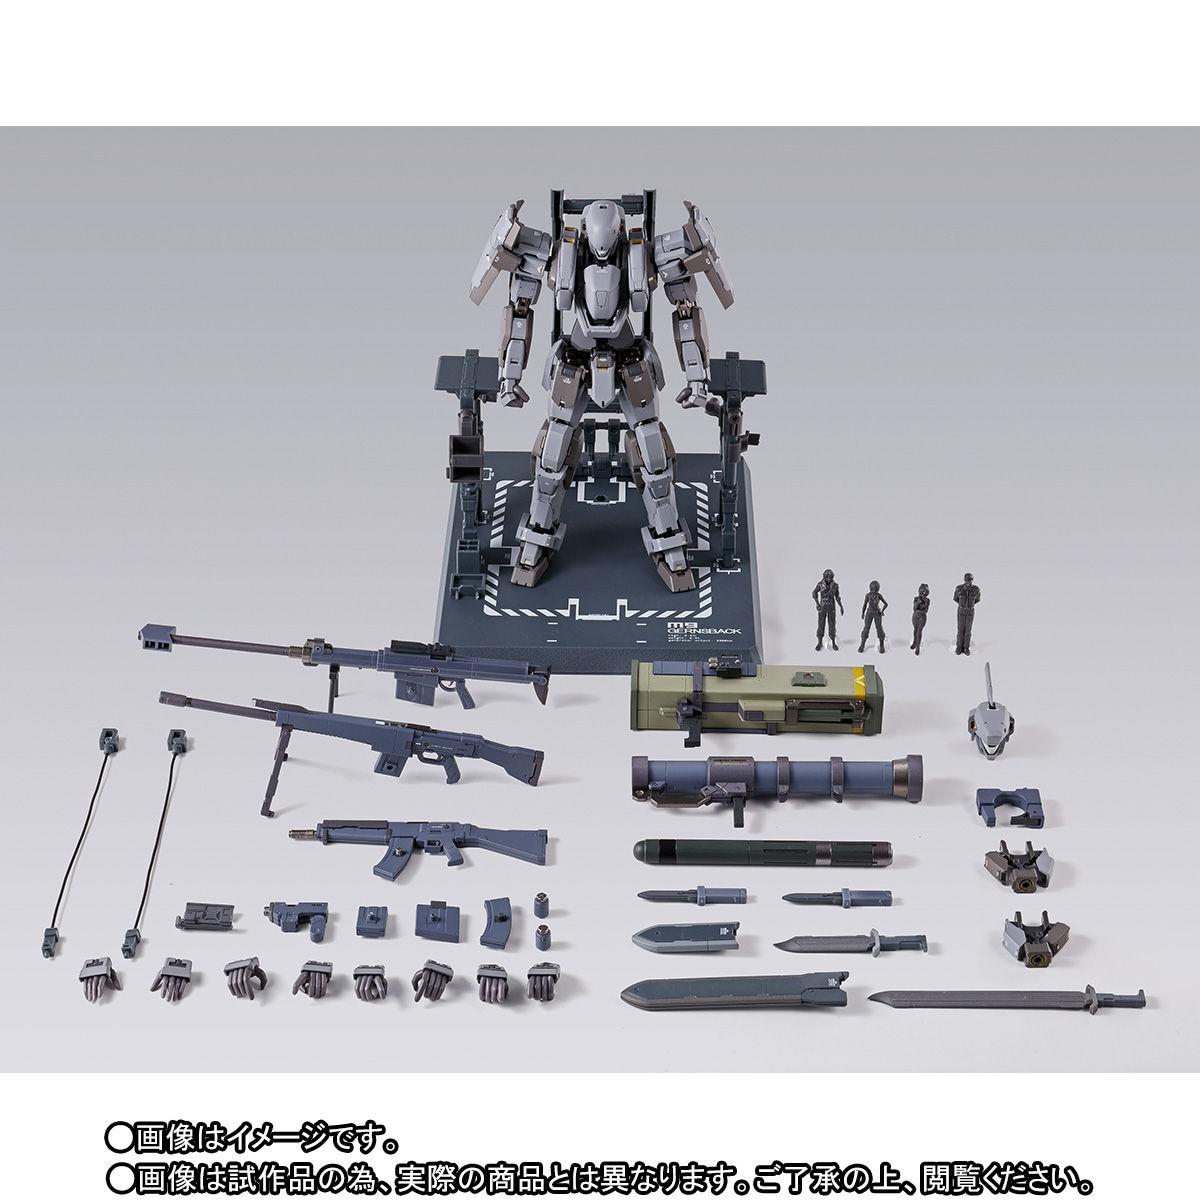 METAL BUILD『ガーンズバック Ver.IV|フルメタル・パニック!IV』可動フィギュア-002